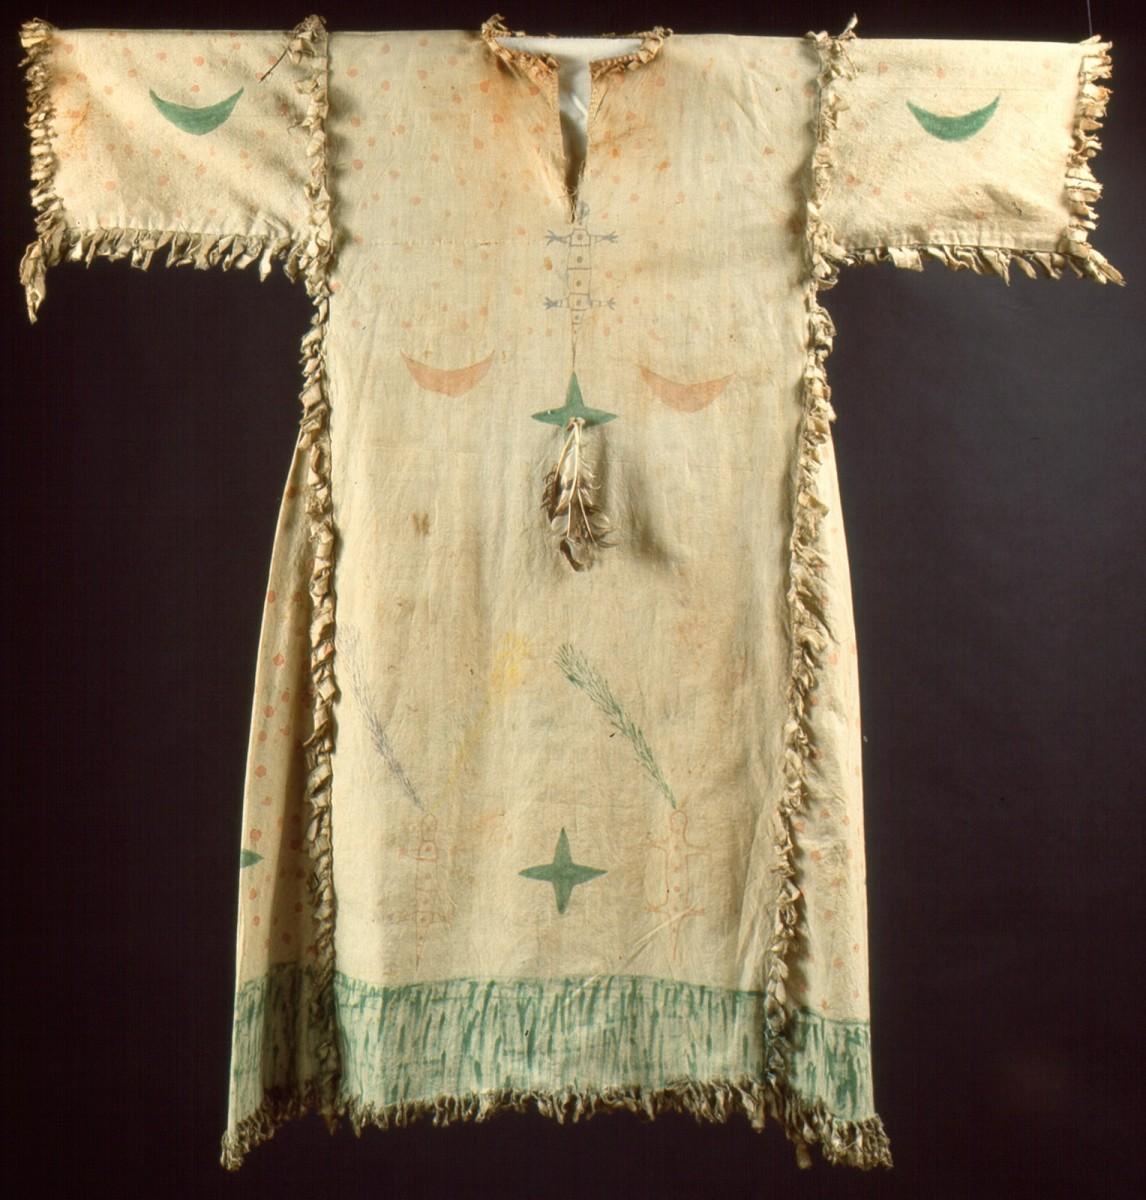 Geistertanzgewand, Lakota oder Blackfoot, Plains, USA, um 1900 Baumwolle, Federn RJM, 49690 Tausch Stolper Galleries, Amsterdam 1967 © RJM, Foto/photo: Rheinisches Bildarchiv Köln